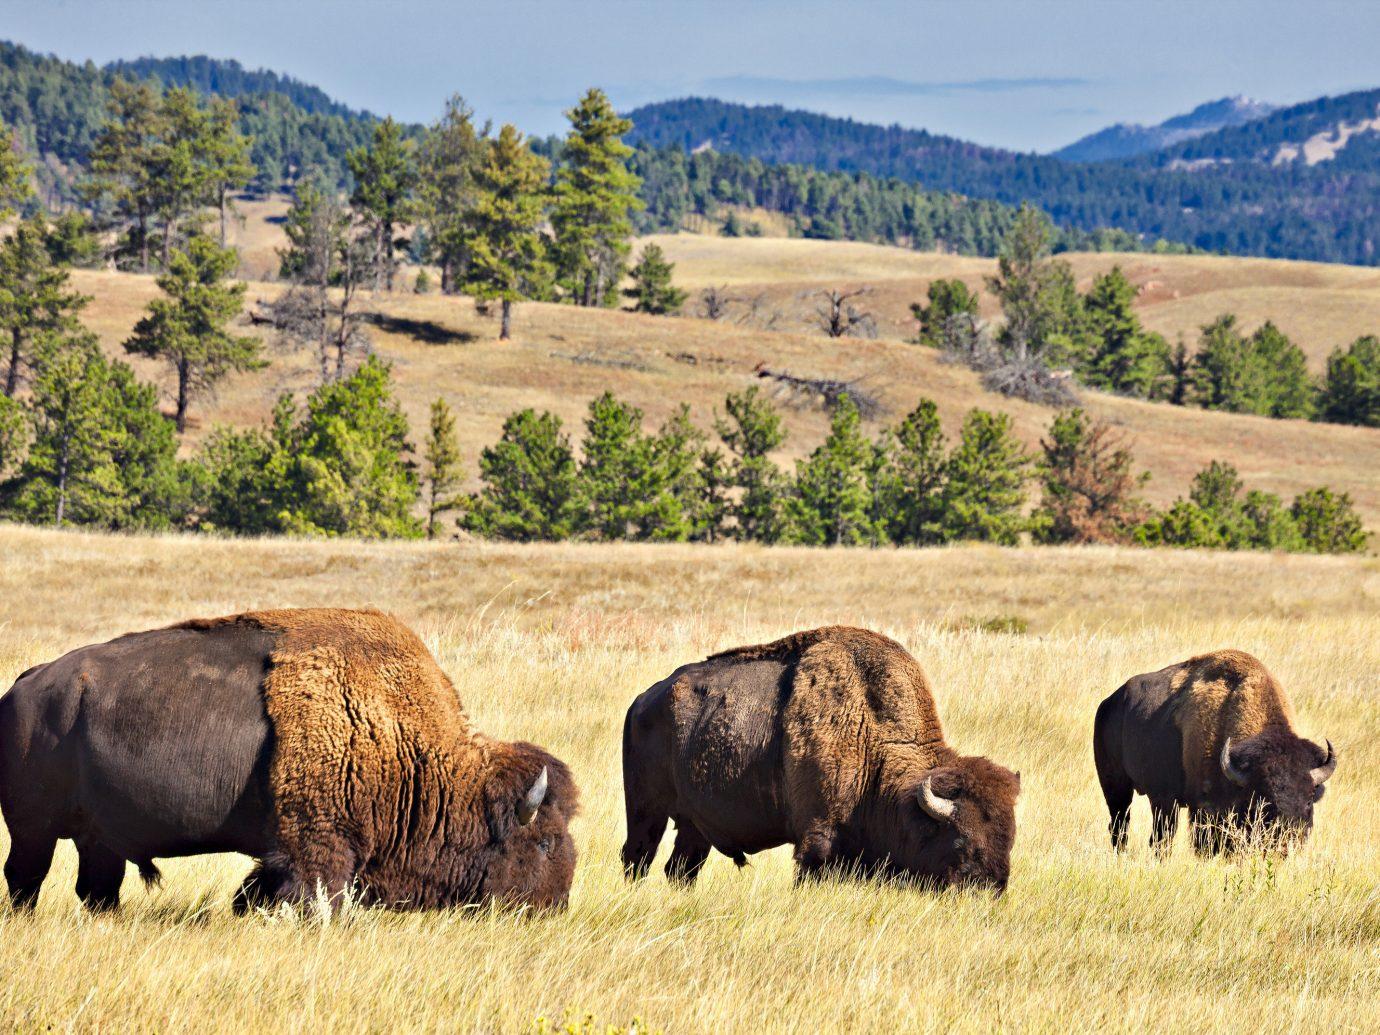 Road Trips Trip Ideas grassland Wildlife bison nature reserve ecosystem wilderness cattle like mammal grazing national park pasture terrestrial animal prairie herd grass highland landscape ecoregion Ranch tree plain